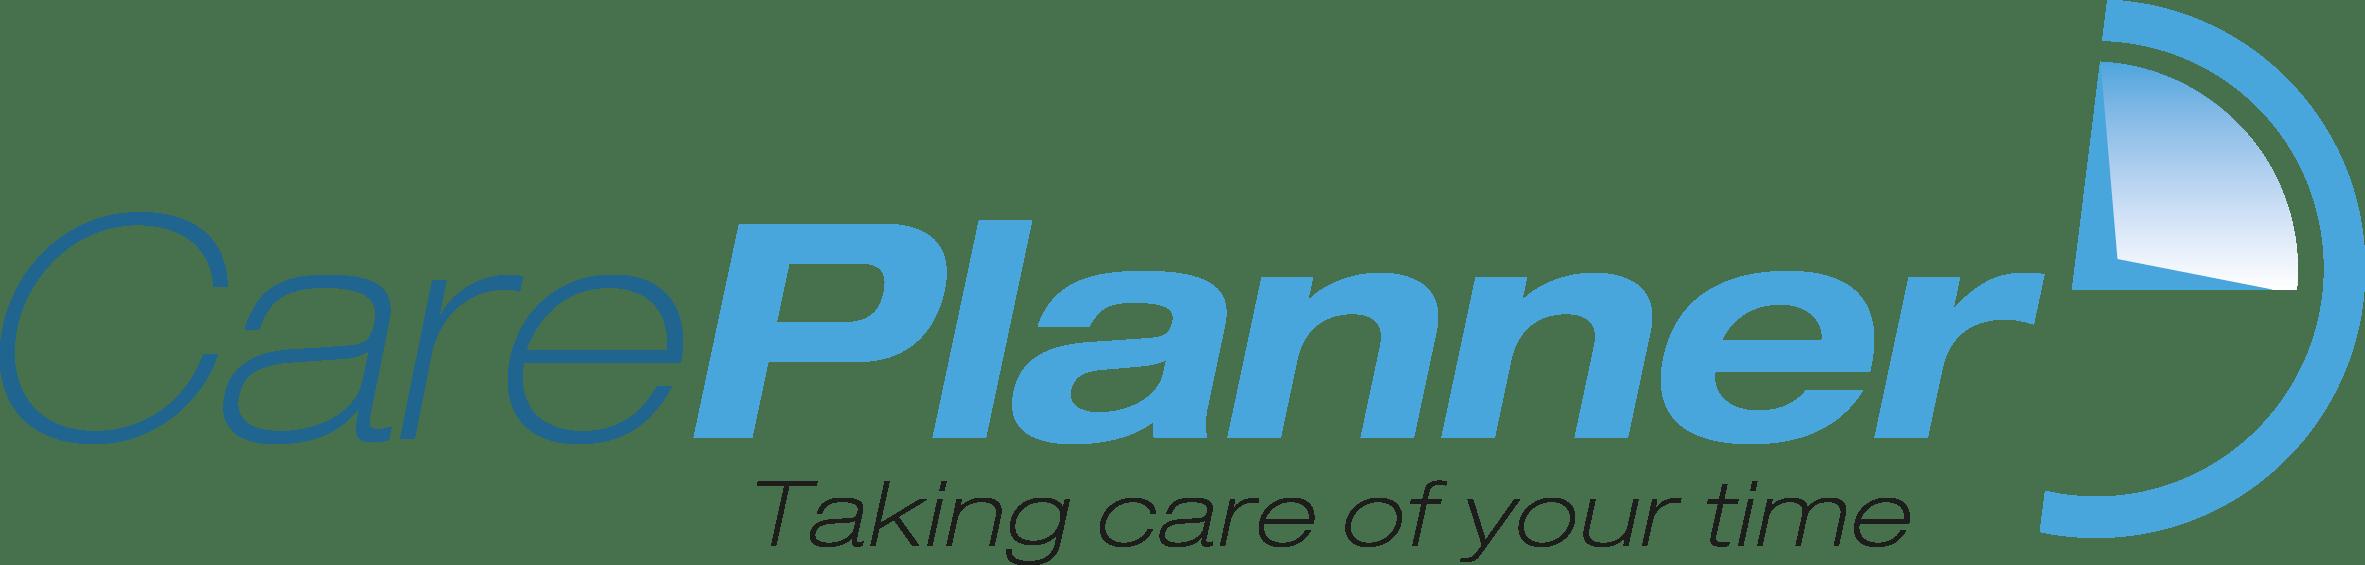 CarePlanner logo with slogan